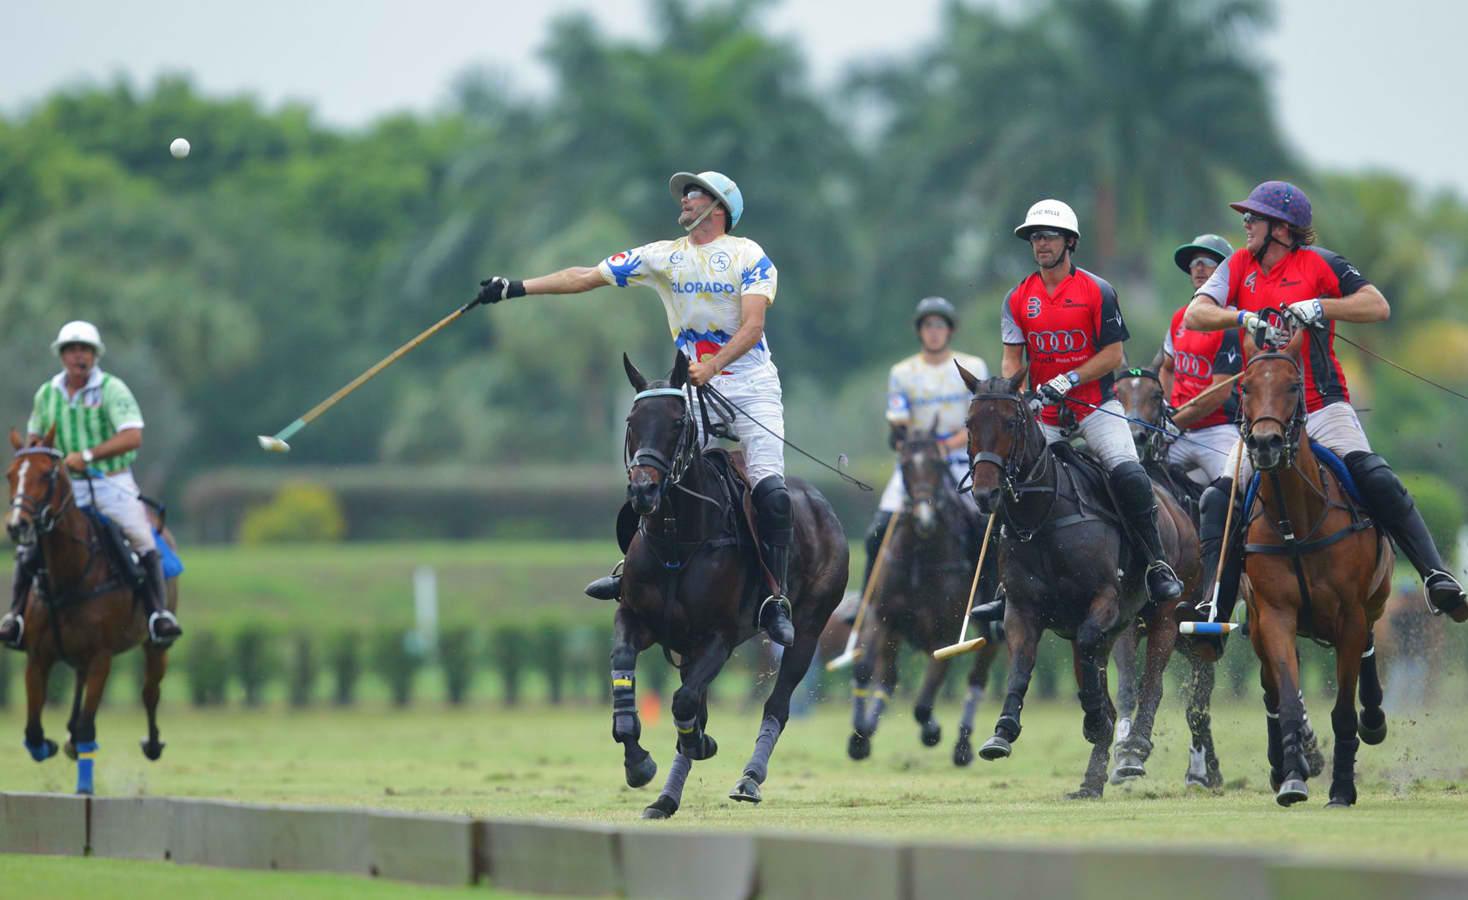 Triple Crown Of Polo In World Polo League Season